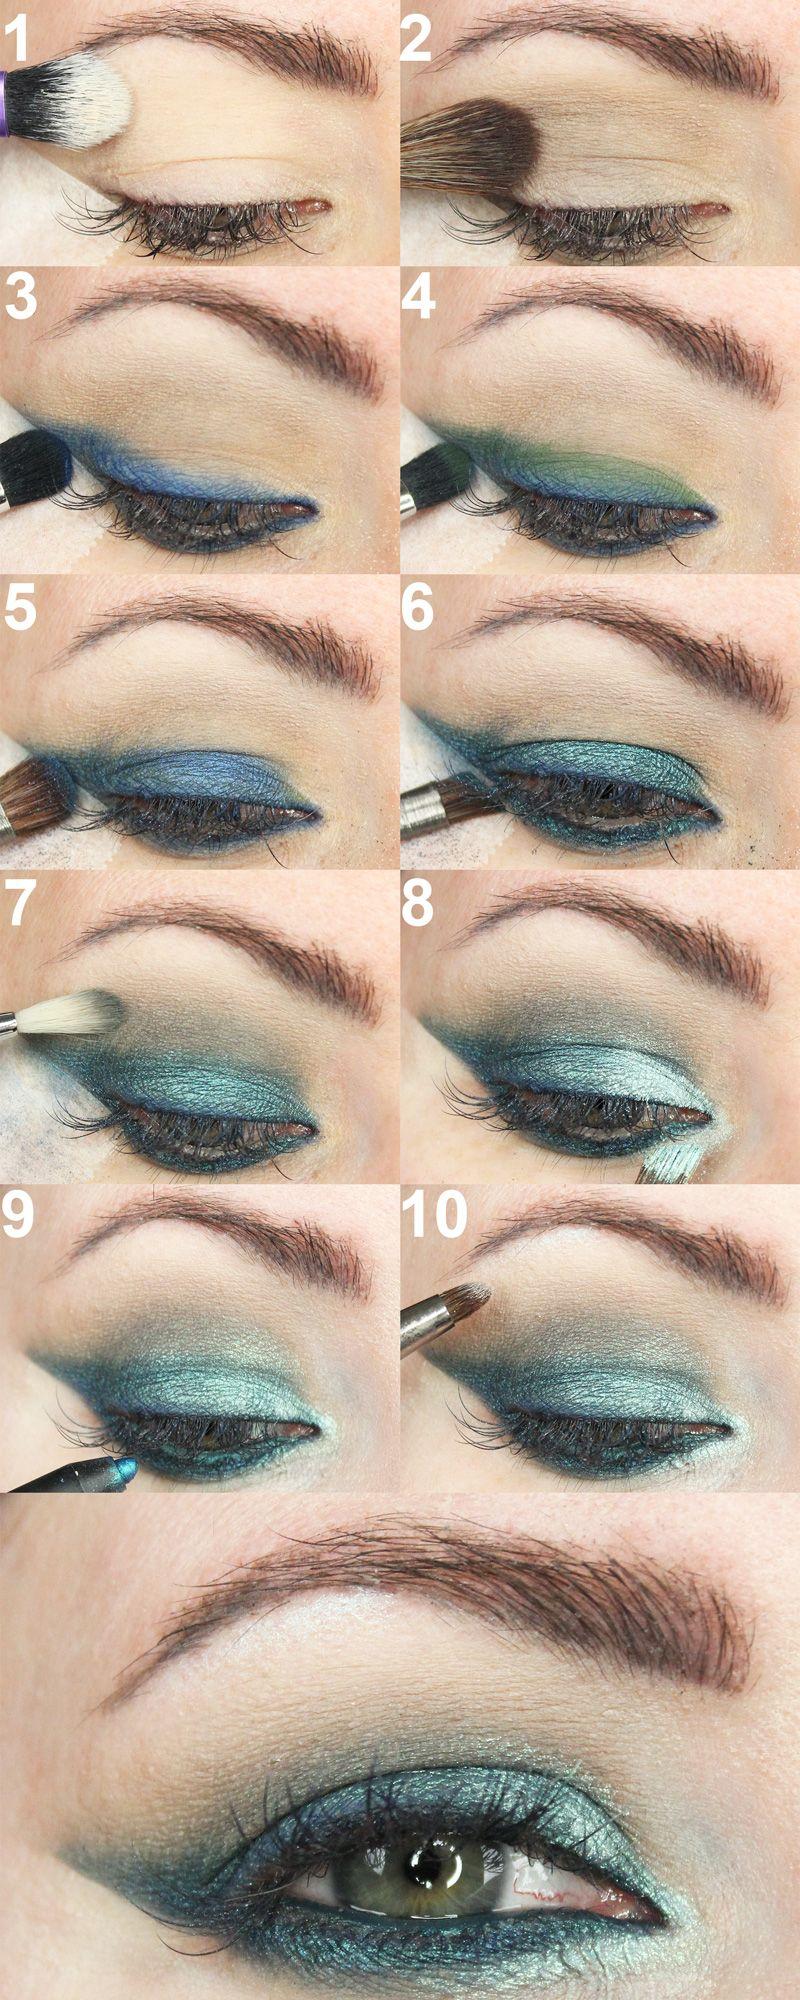 Kat von d metalmatte tutorial smoky teal hooded eye makeup kat von d metalmatte tutorial smoky teal hooded eye makeup tutorial baditri Choice Image